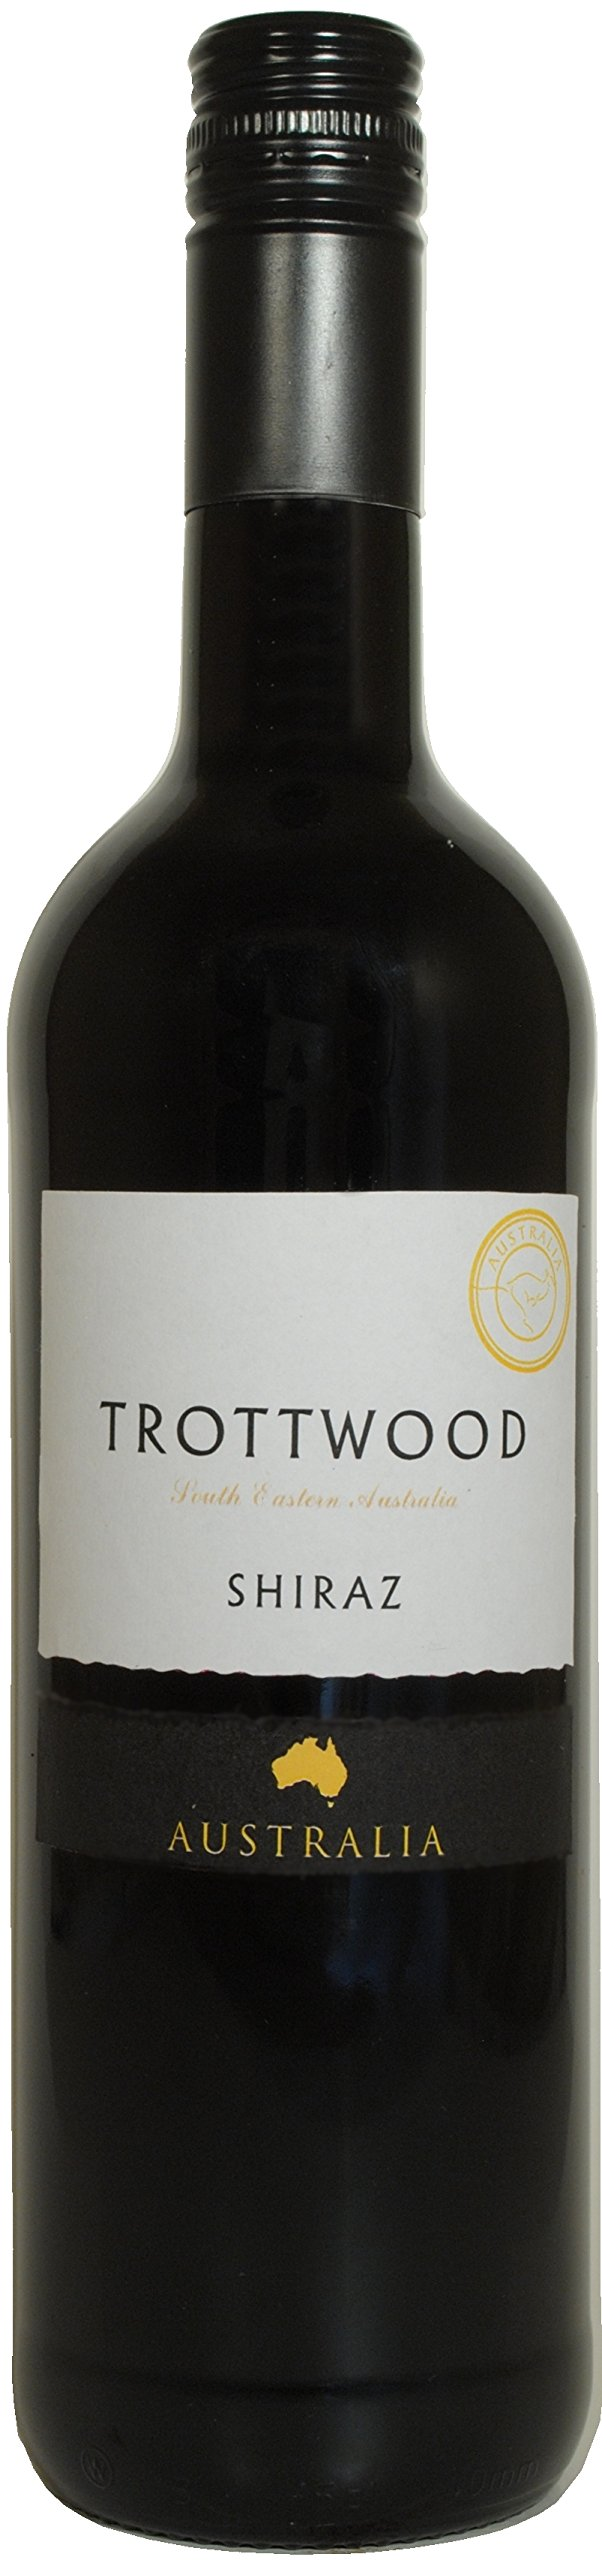 Trottwood-Shiraz-Liter-2016